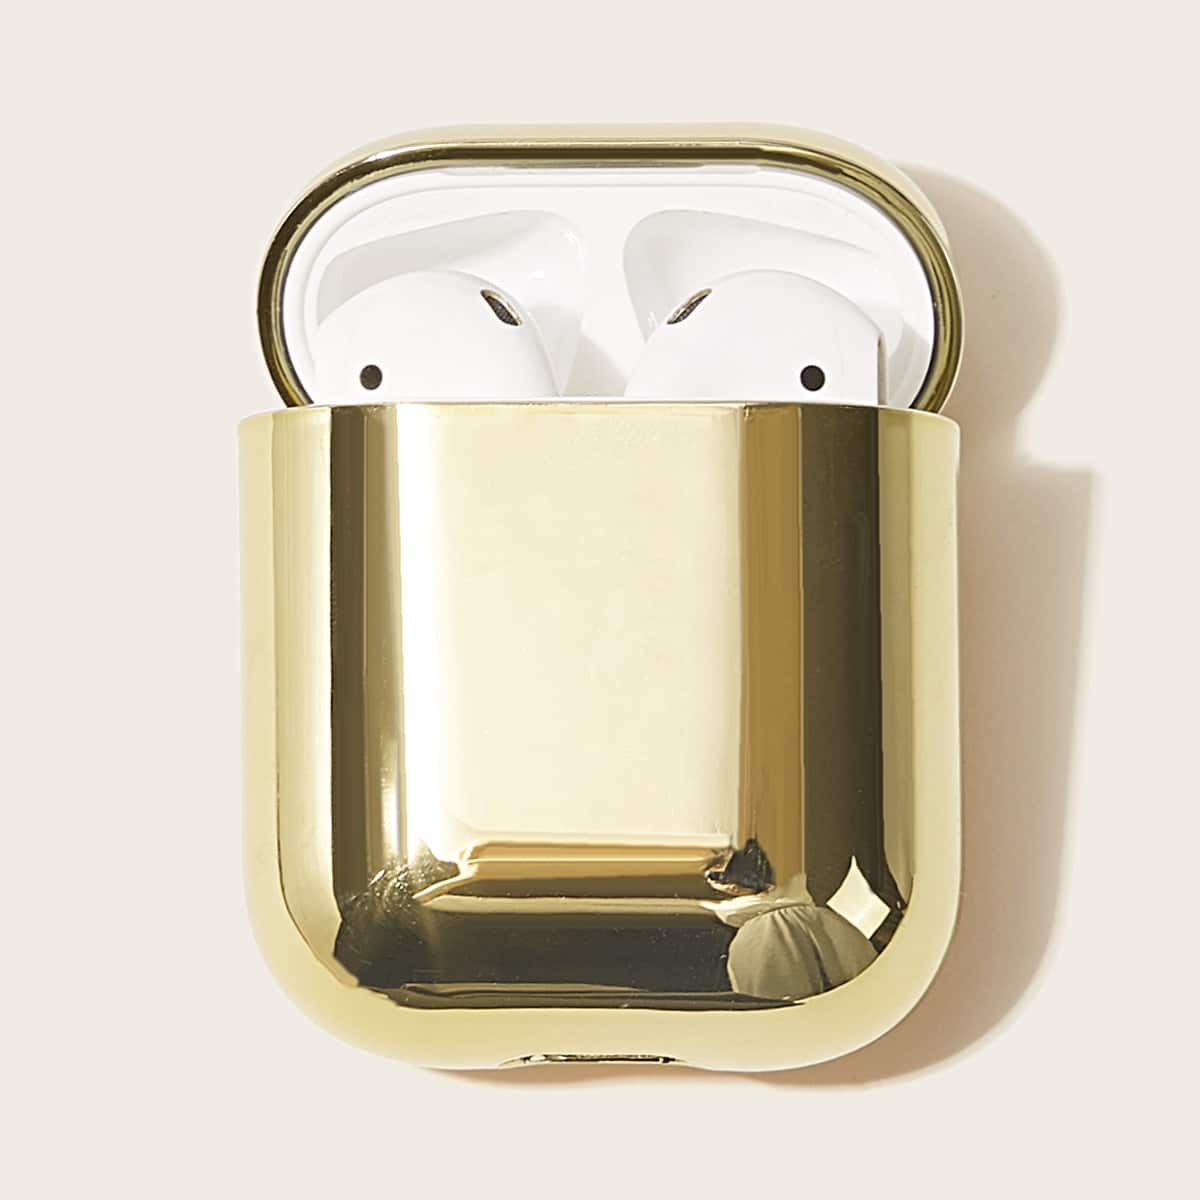 Metalen Airpods Box Protector